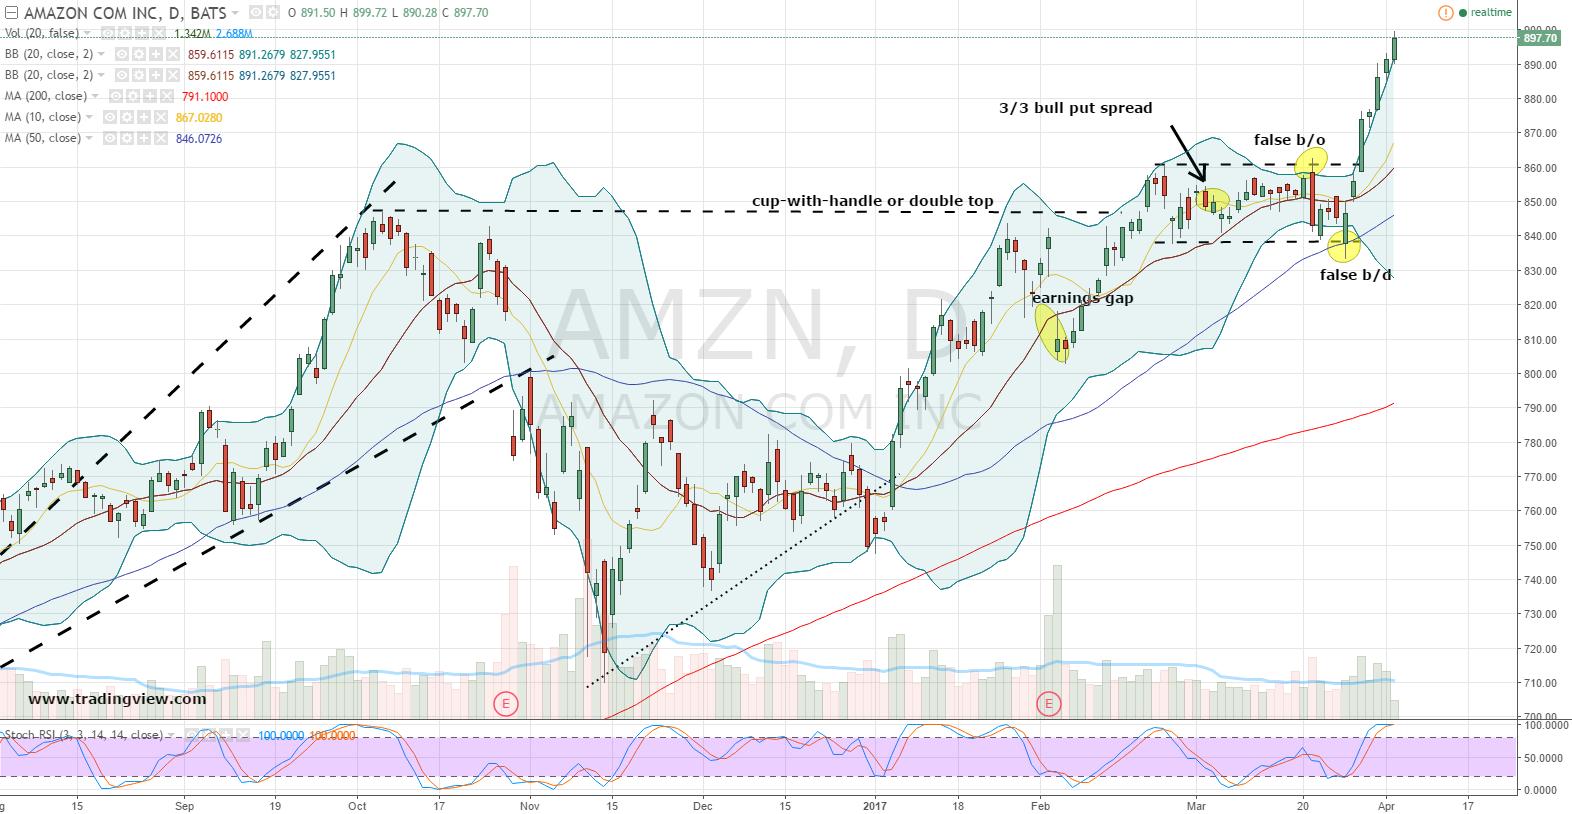 Amazon Stock Daily Chart